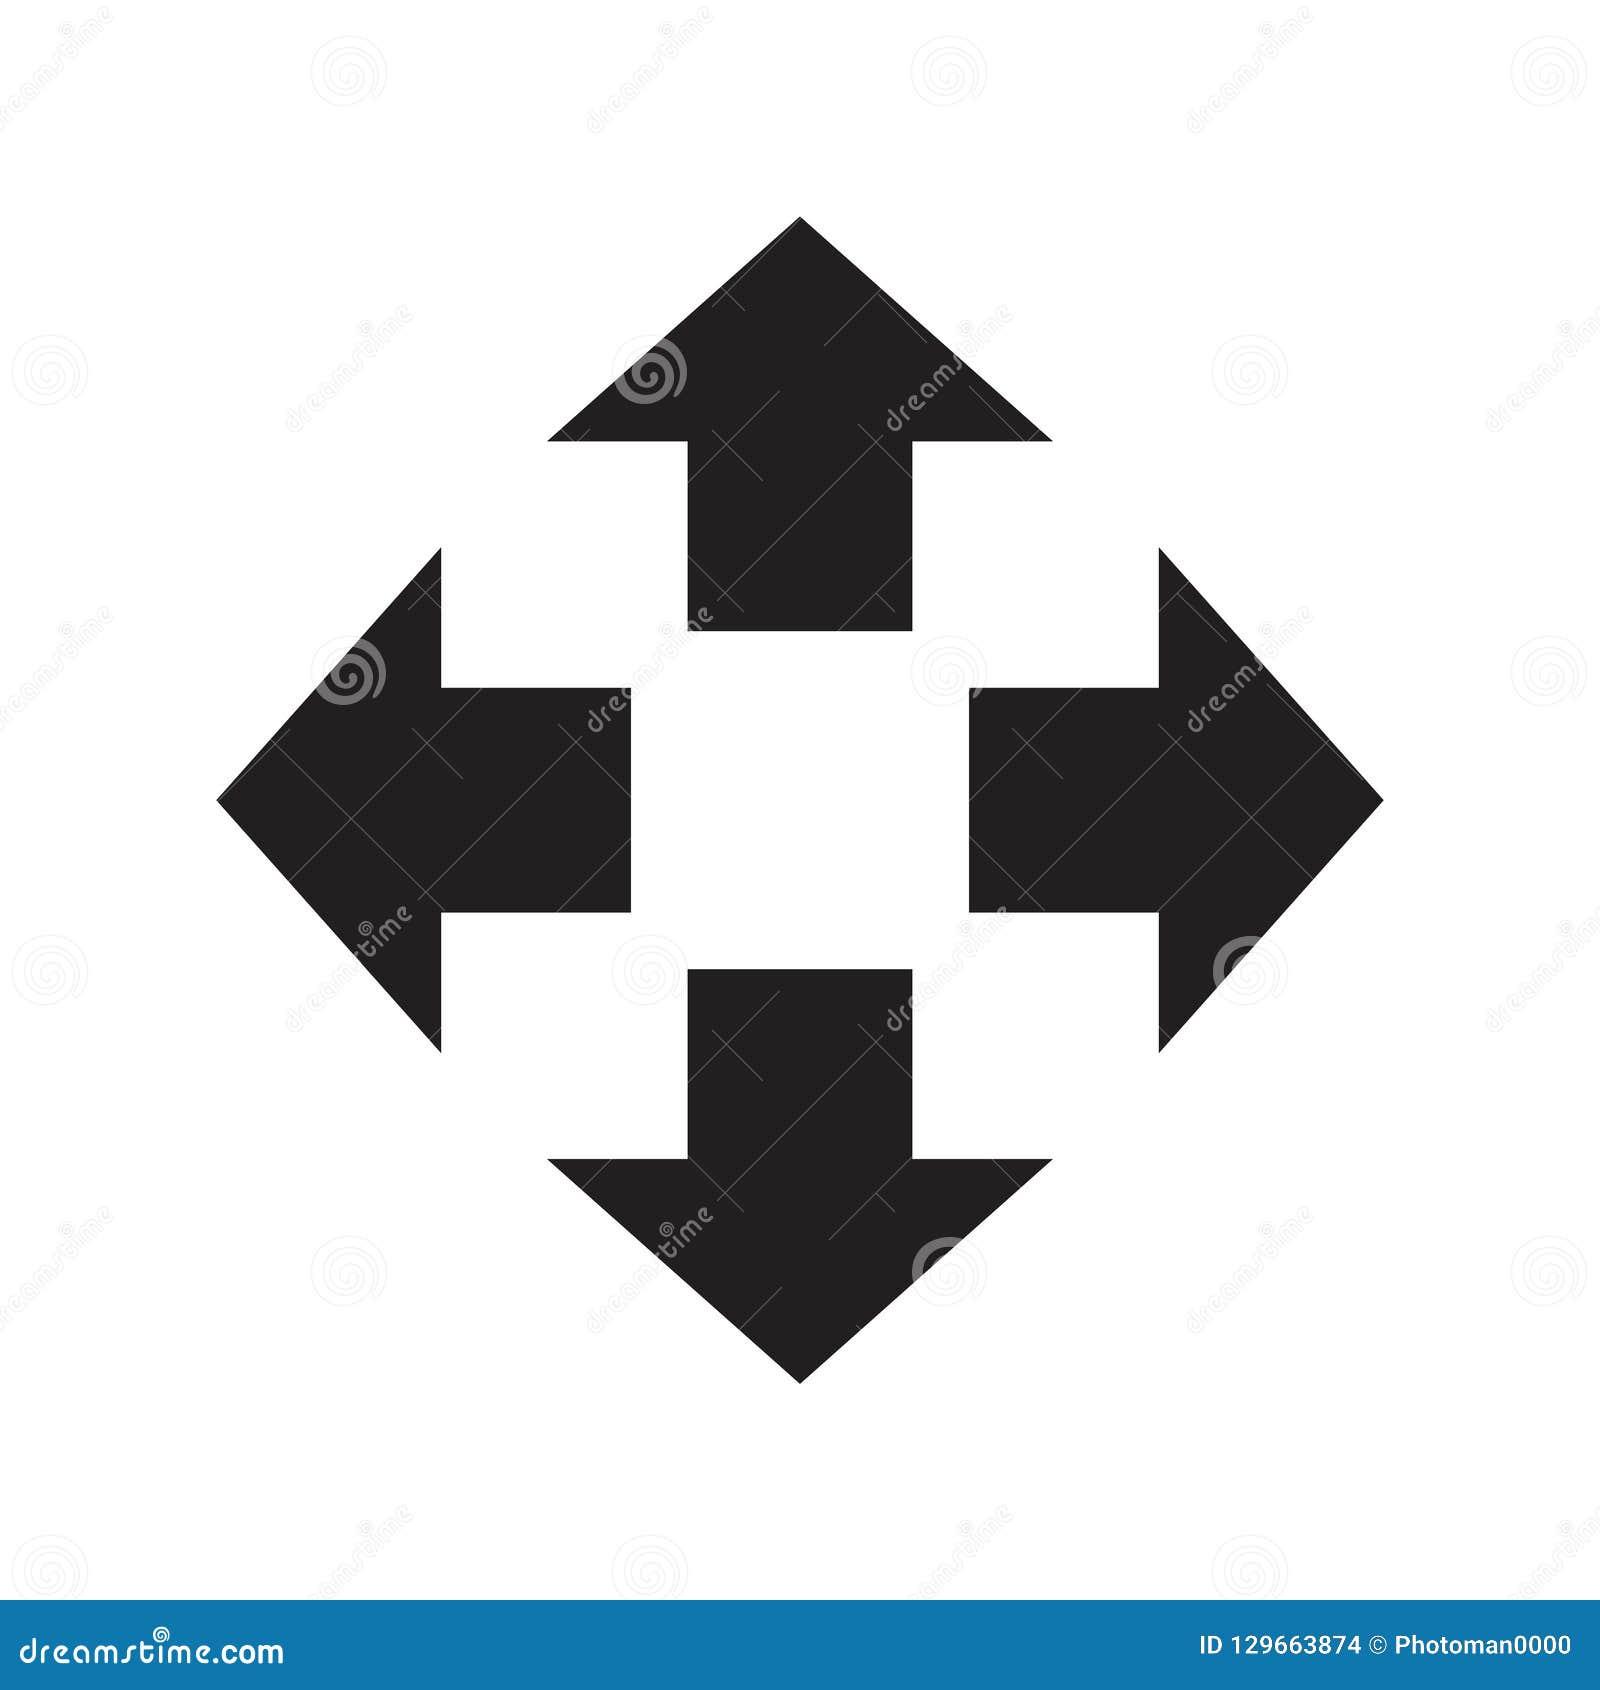 Arrows to the four destinations